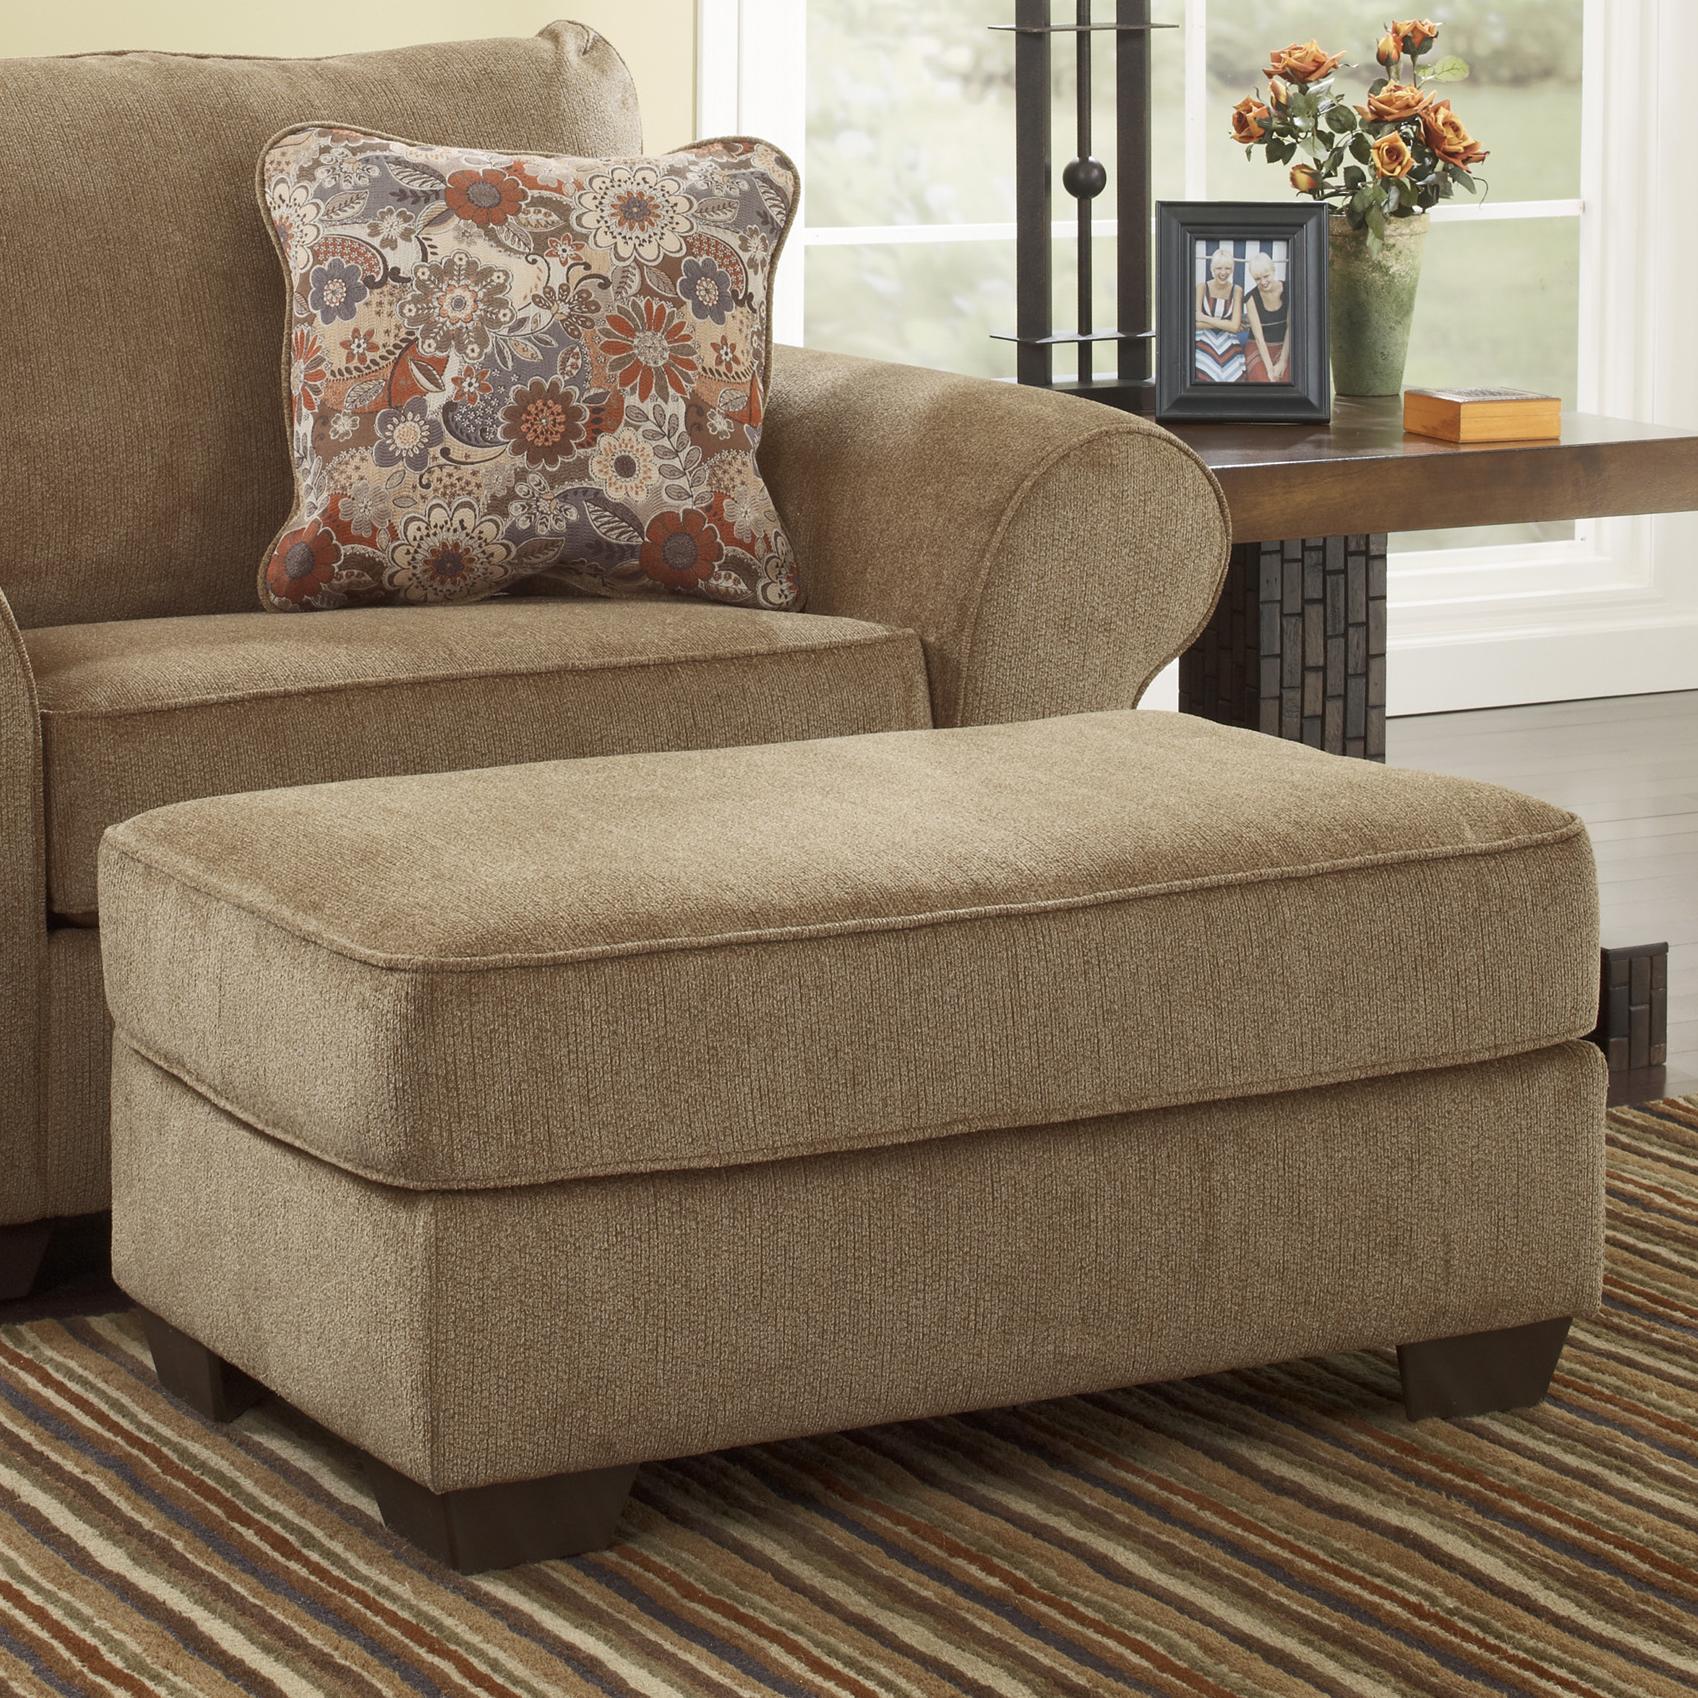 Ashley Furniture Galand - Umber Ottoman - Item Number: 1170014